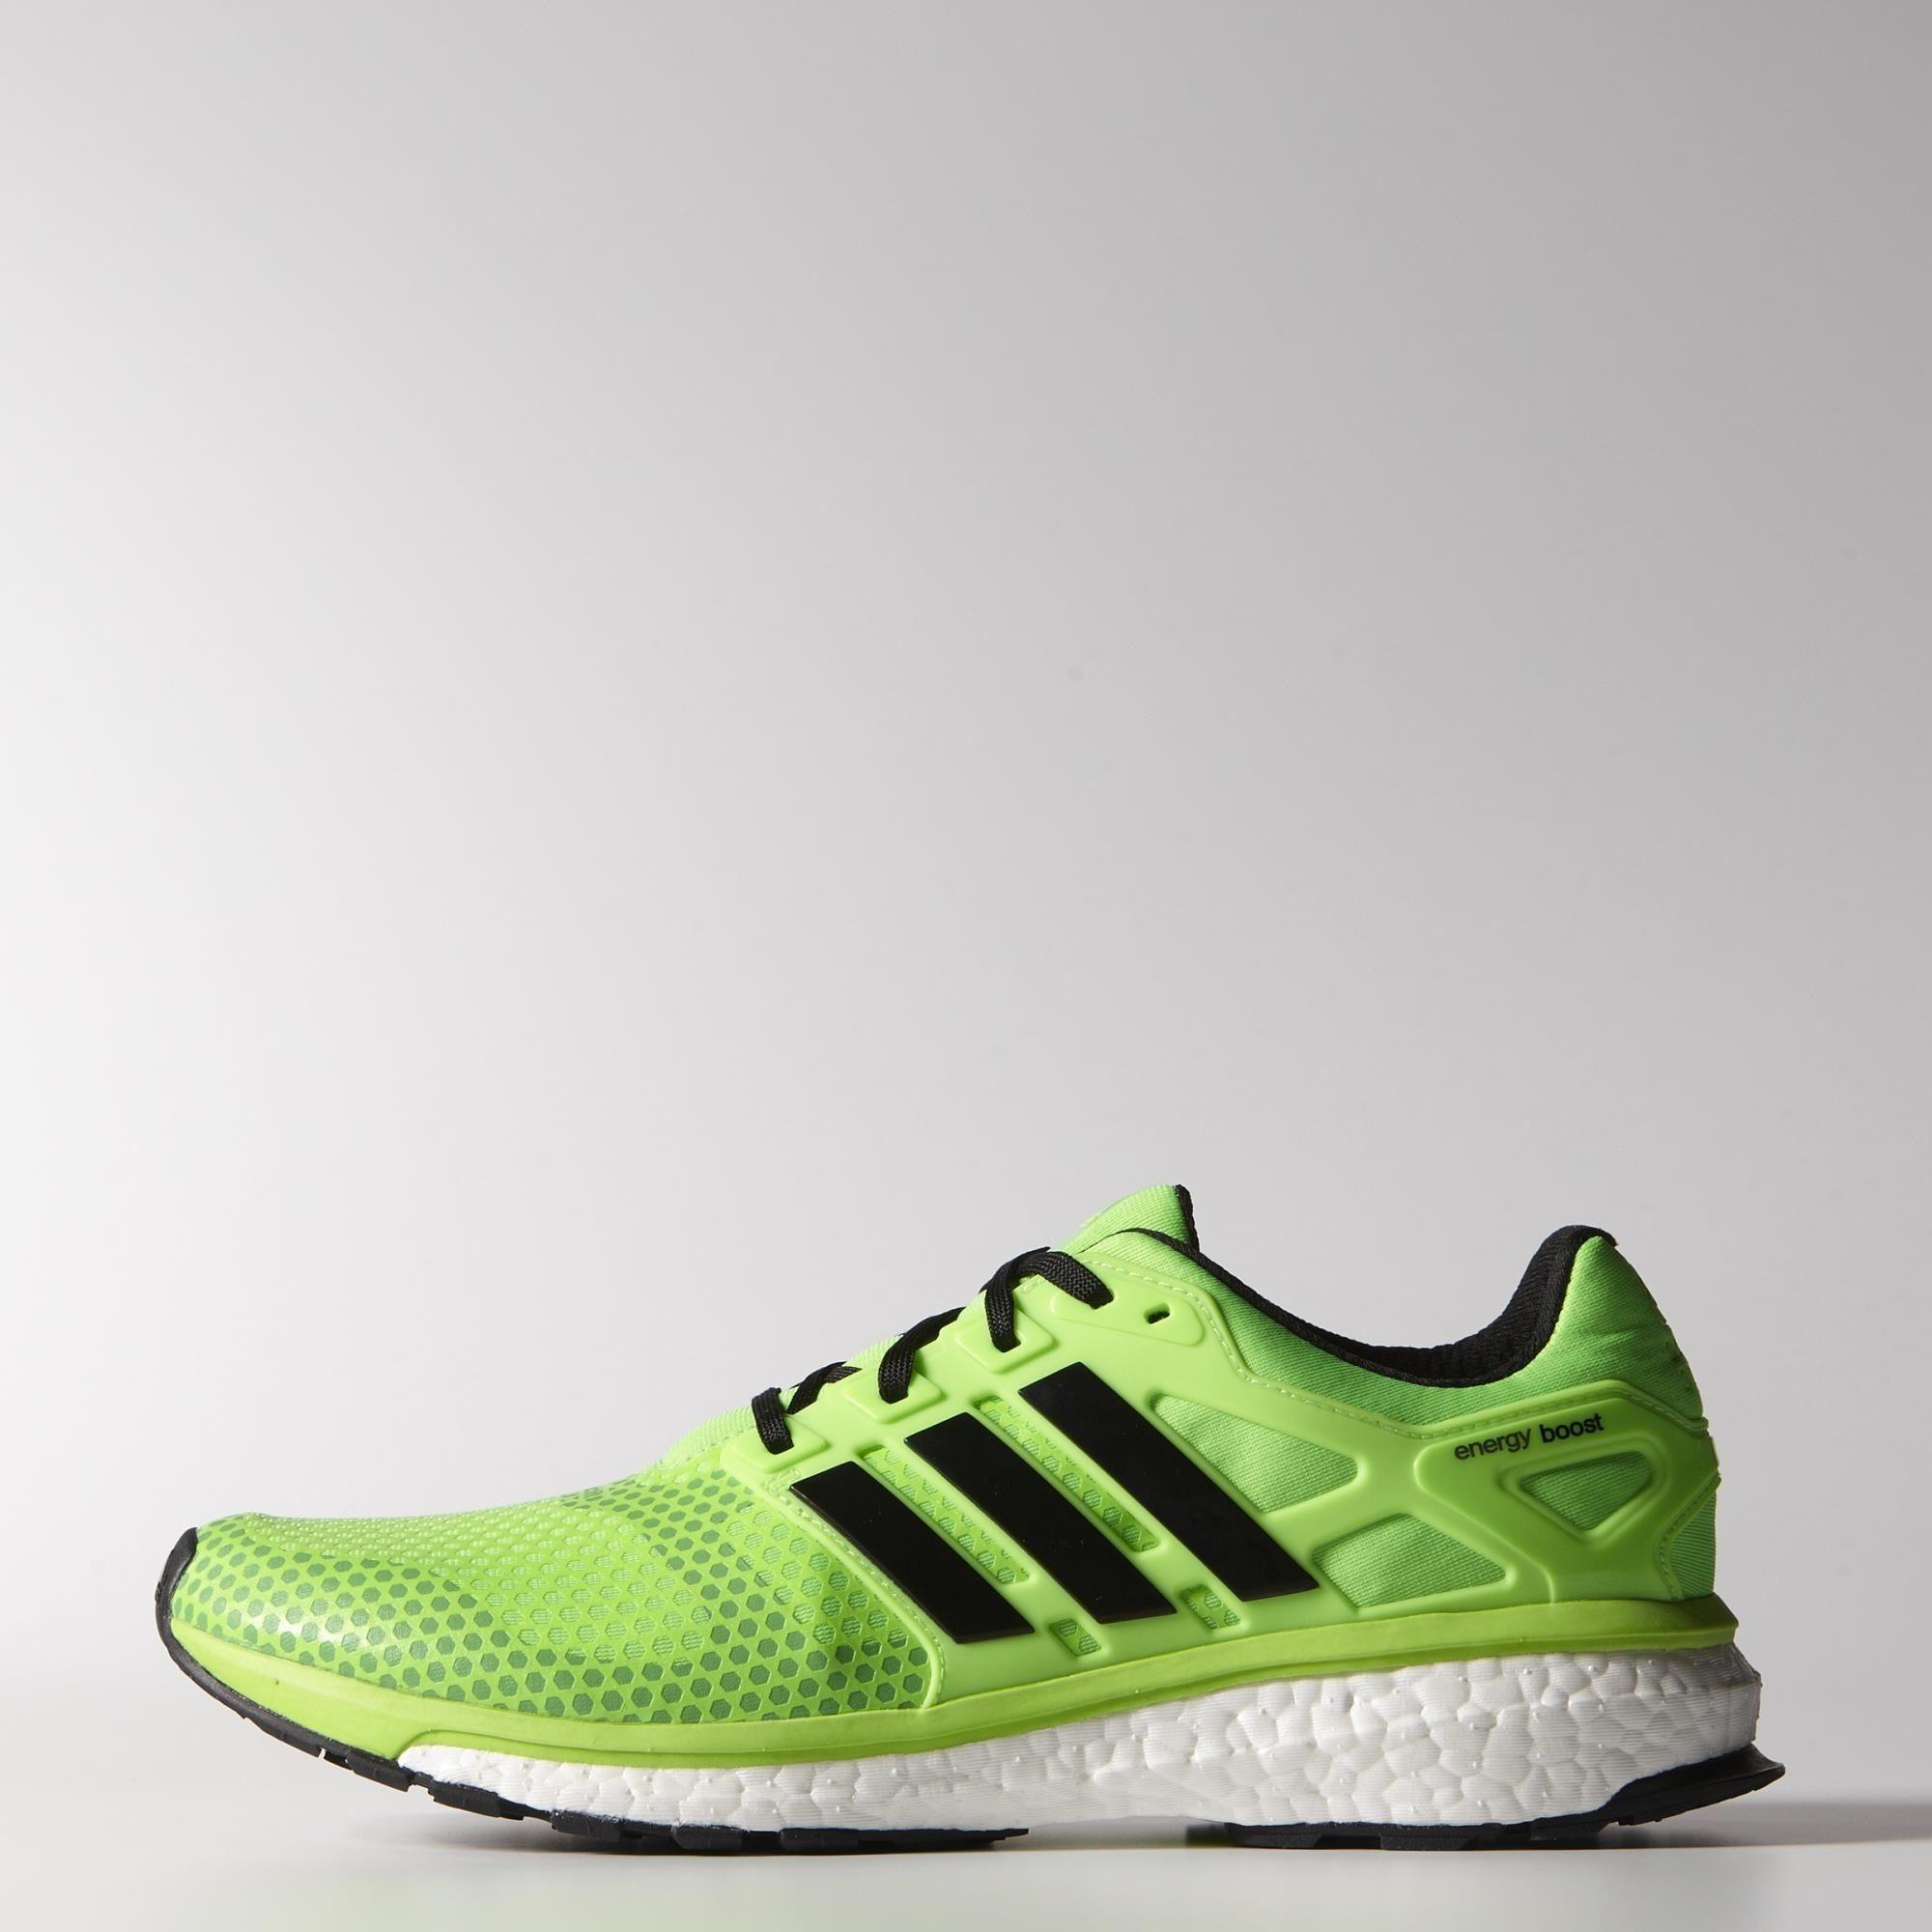 adidas energy boost 2.0 atr